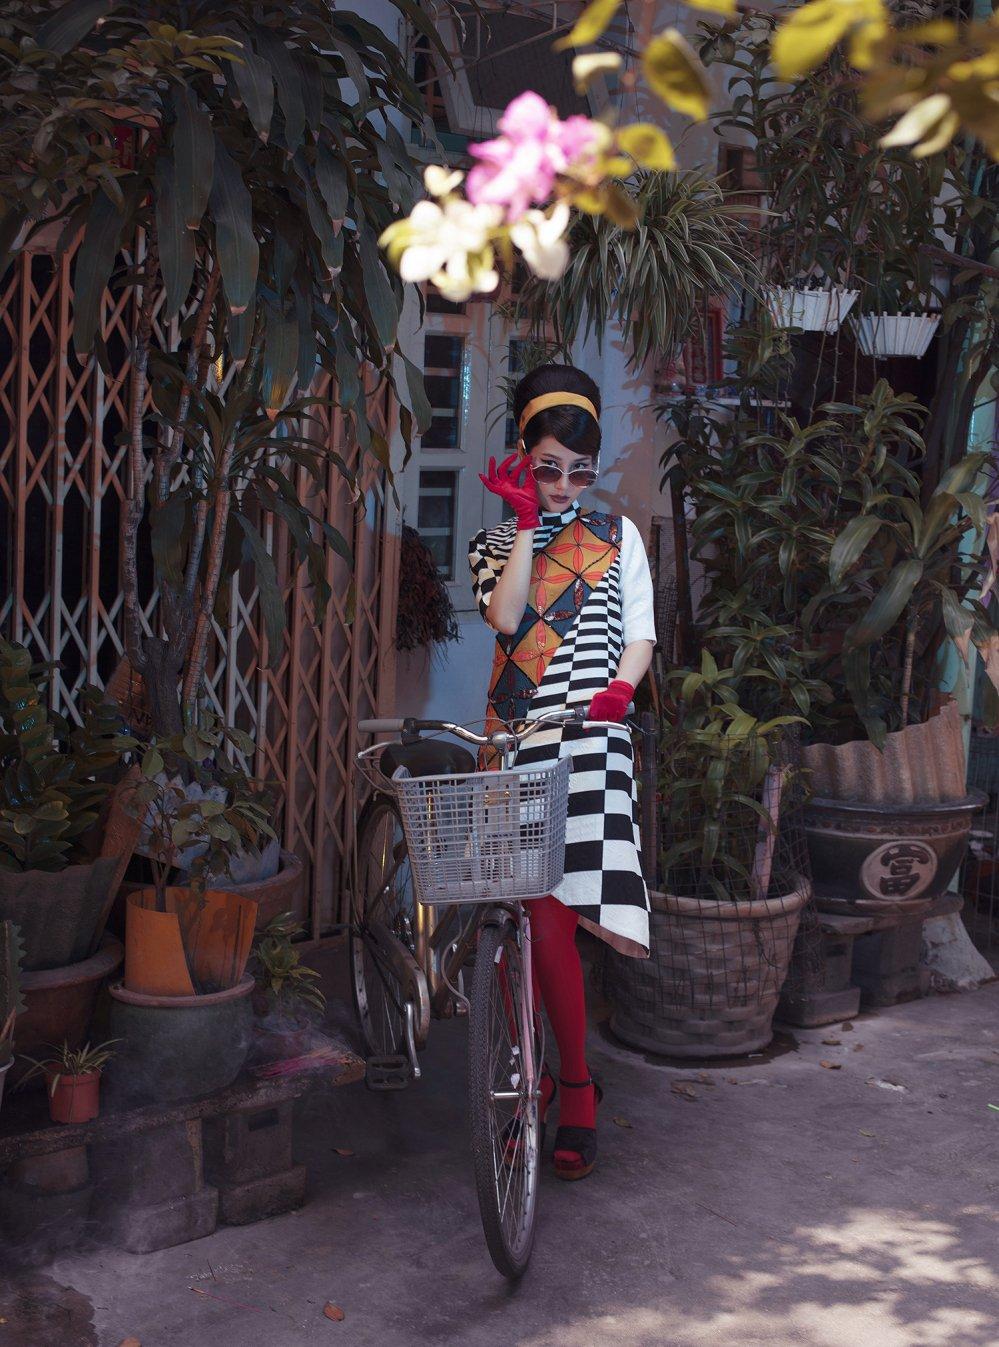 Ninh Duong Lan Ngoc, Diem My 9x dien ao dai tai hien hinh anh Sai Gon xua hinh anh 5